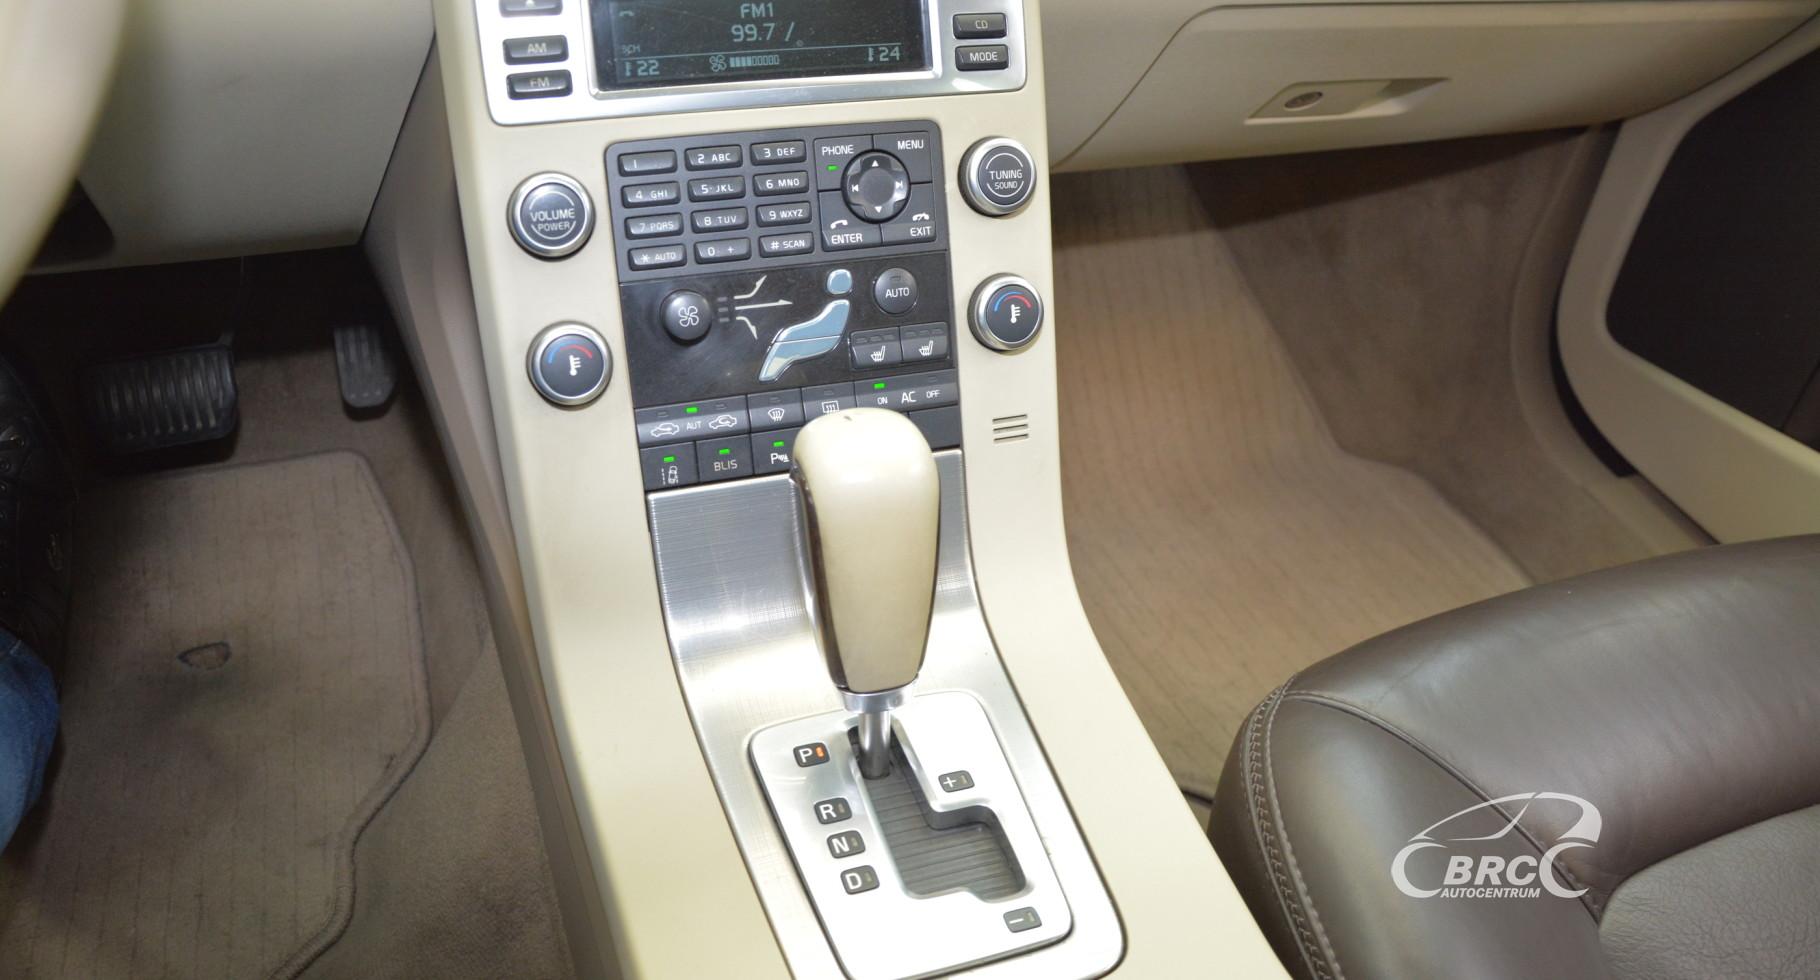 Volvo XC 70 2.4D AWD Sumumm